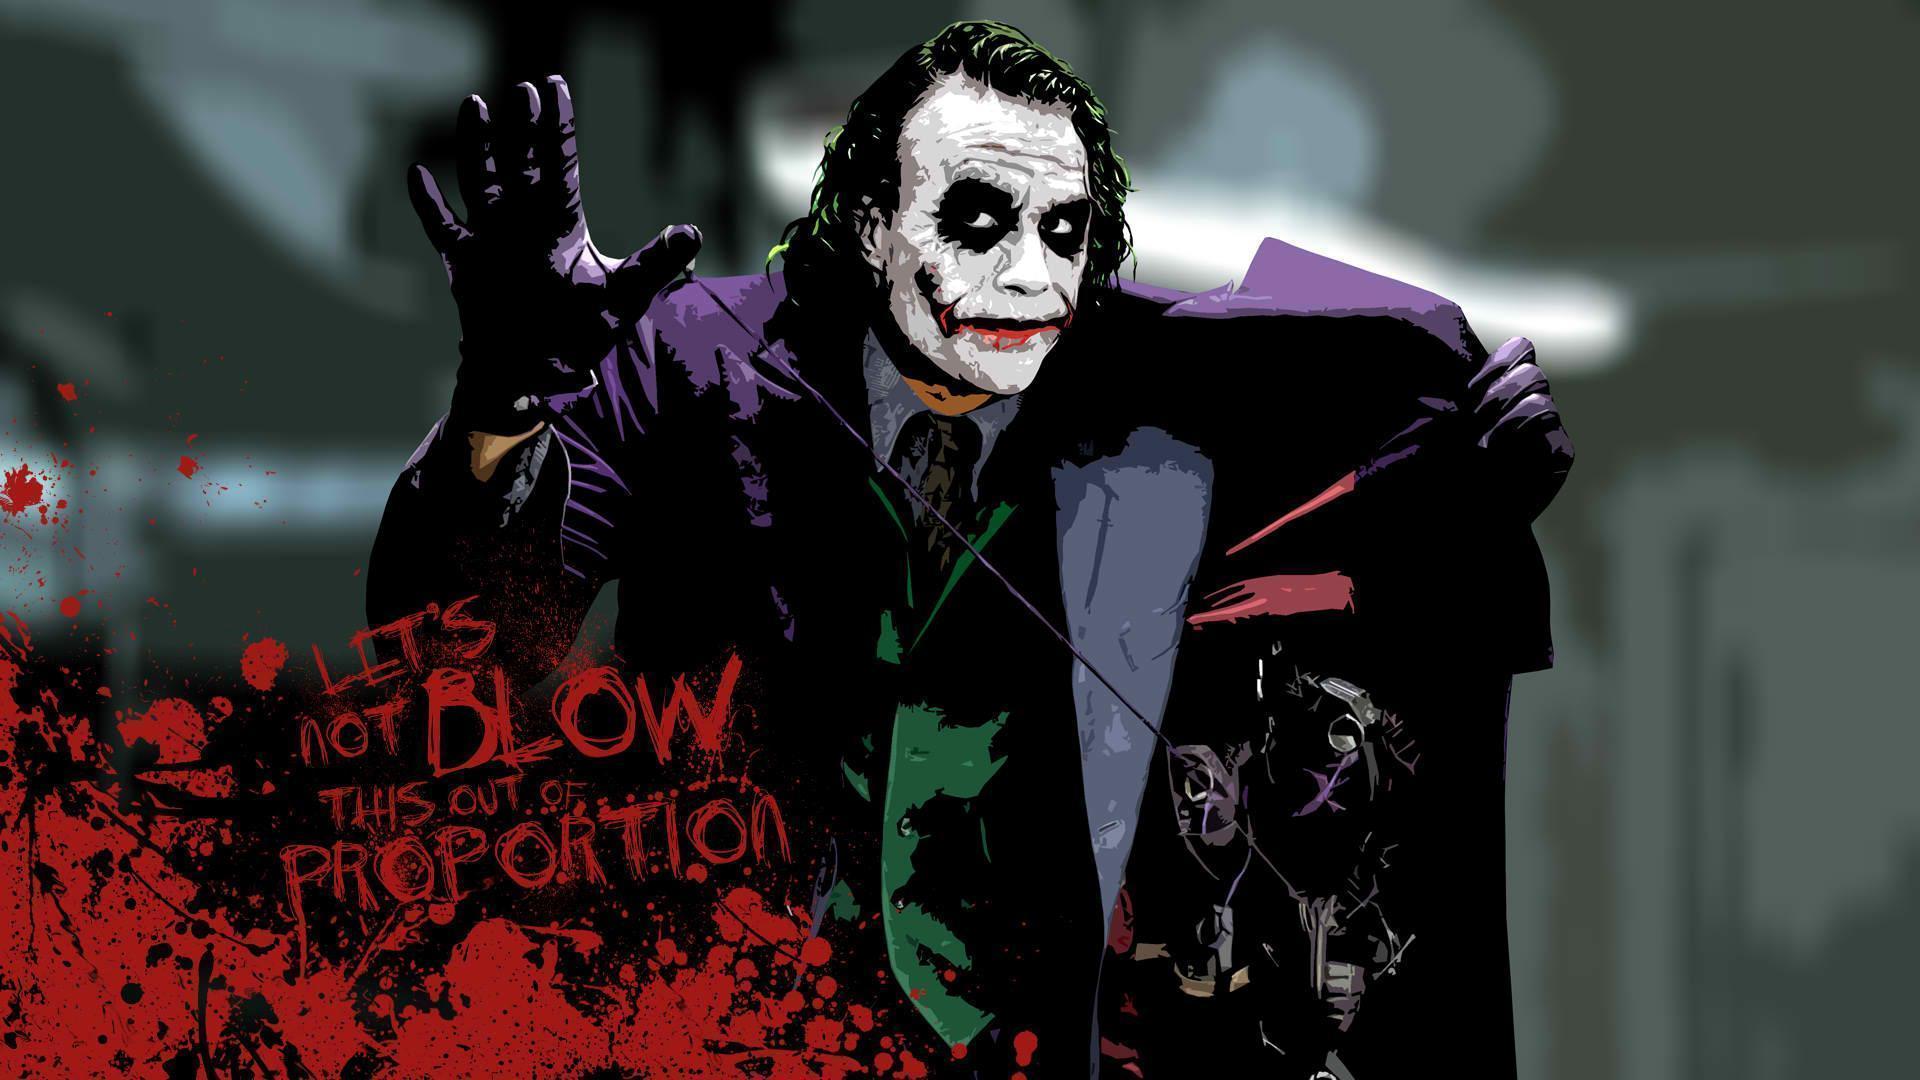 joker wallpaper pc - photo #41